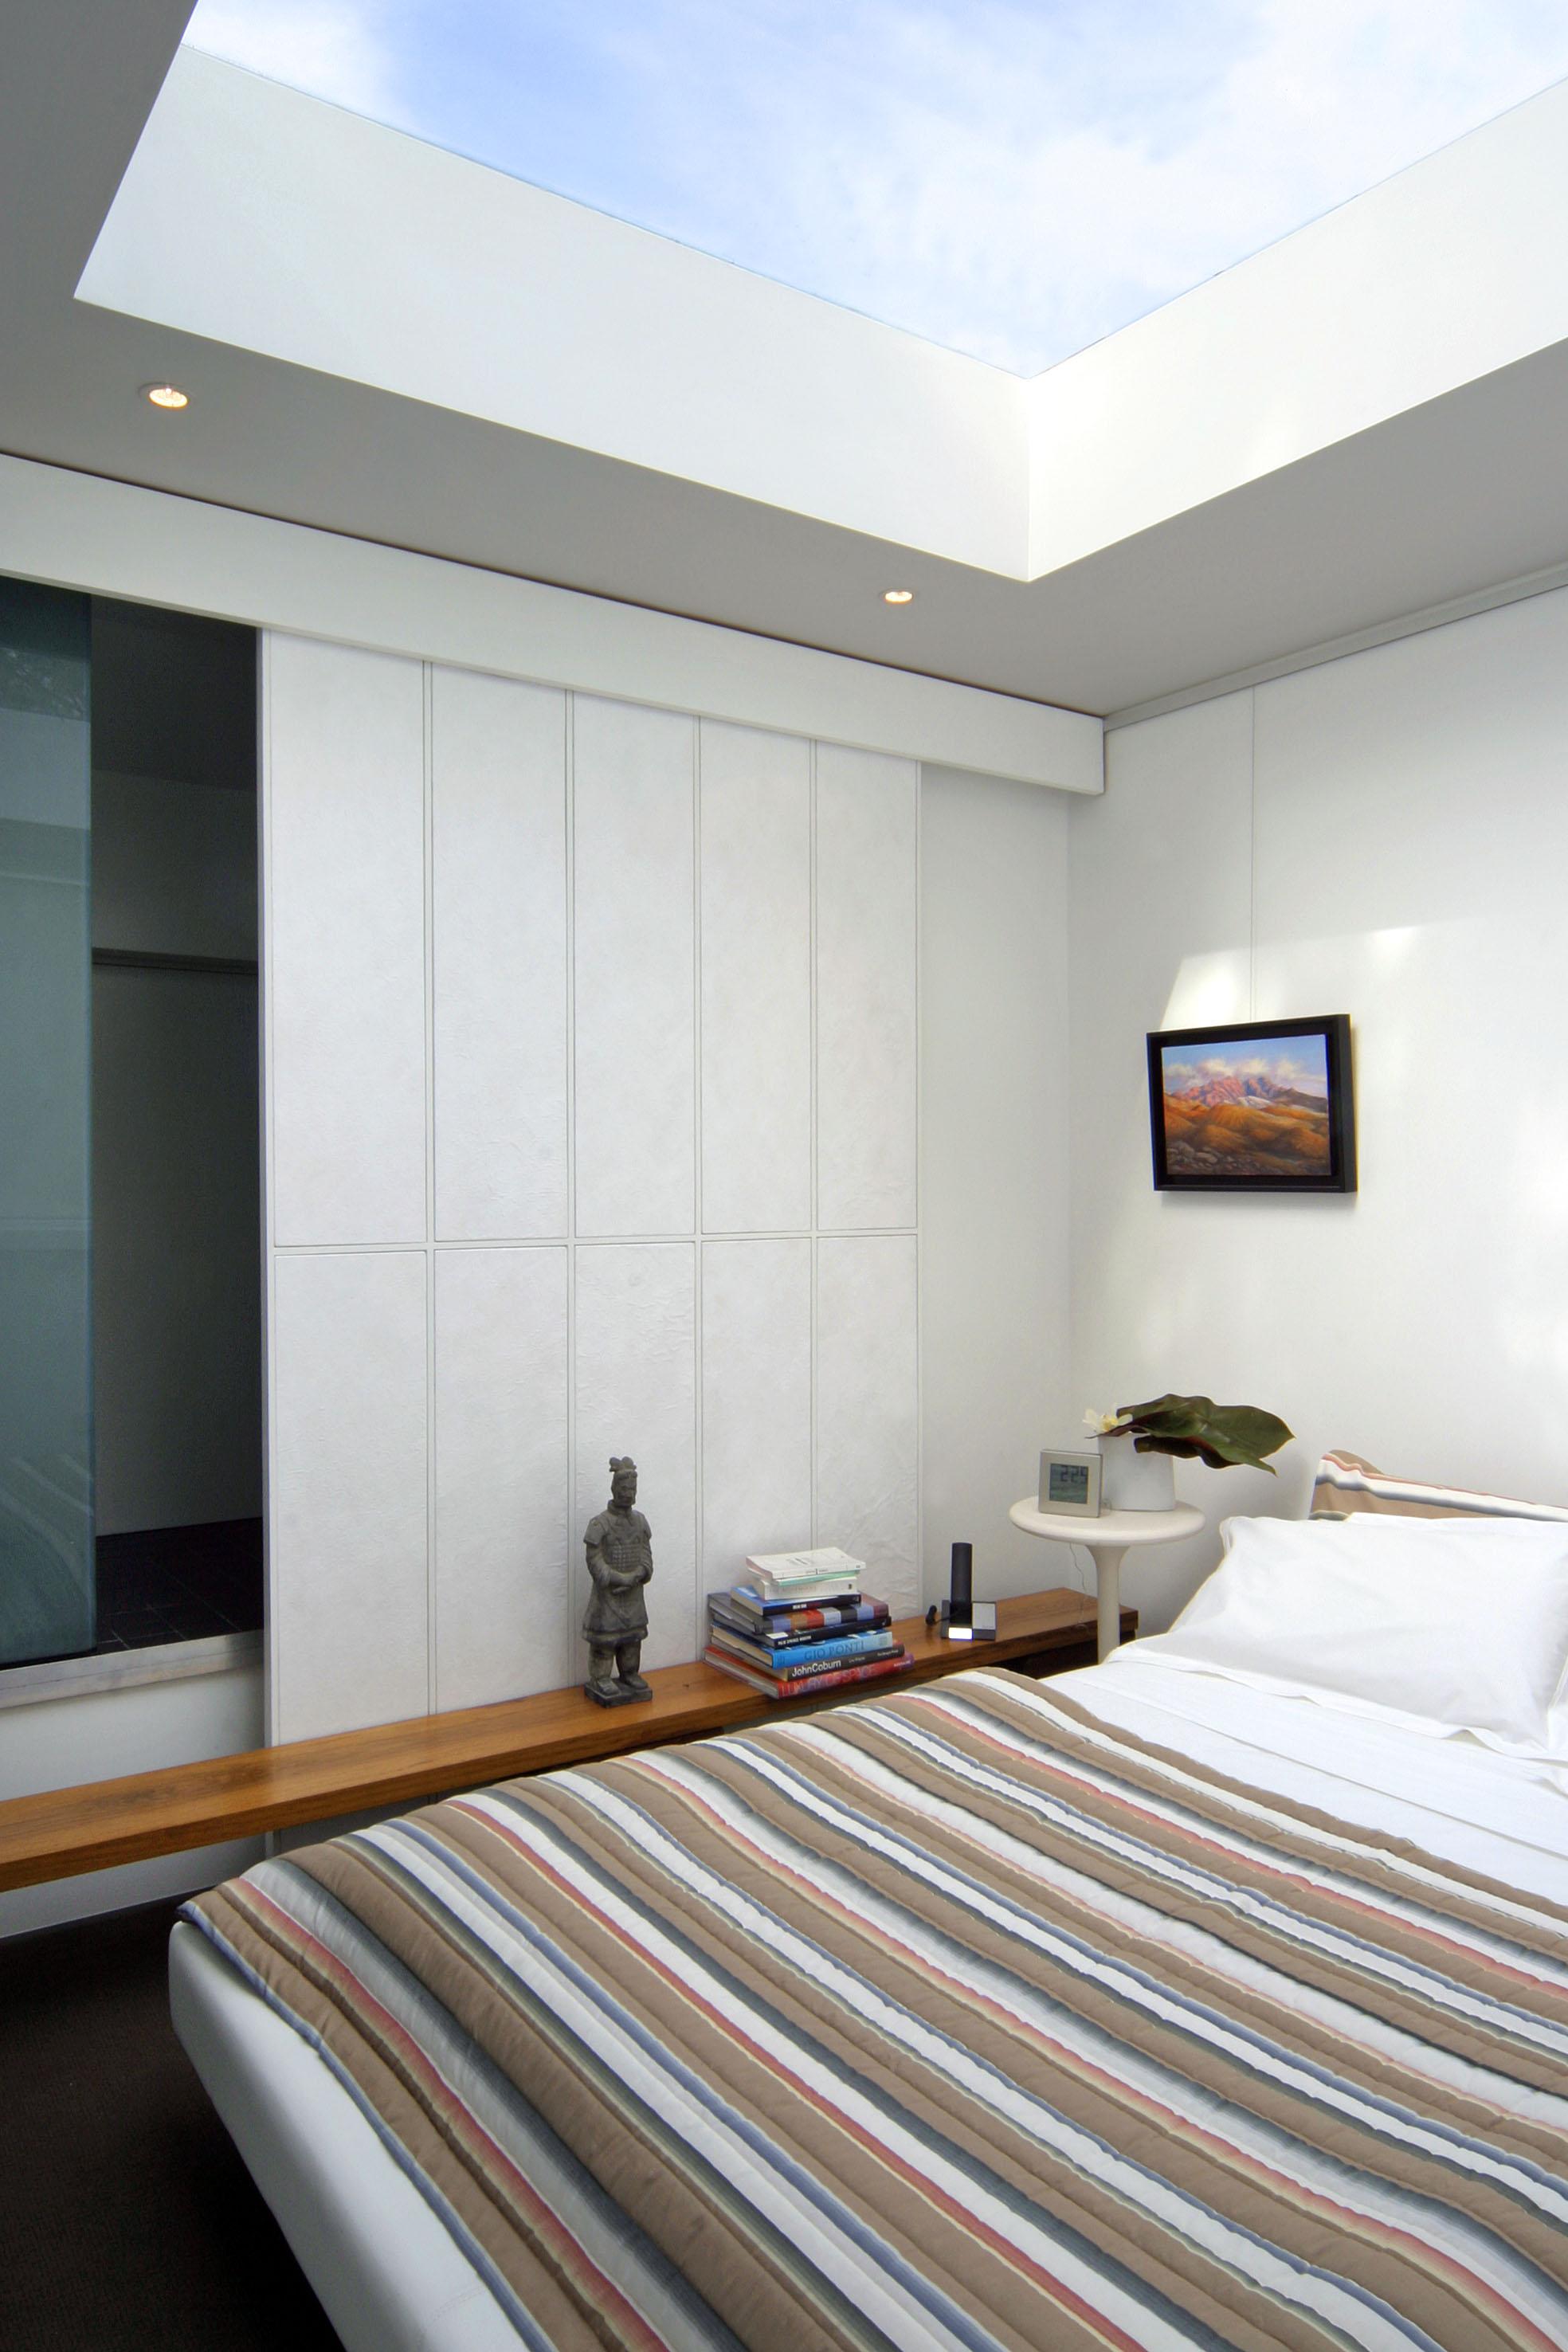 Interior of terrace home built using Boxspan framing